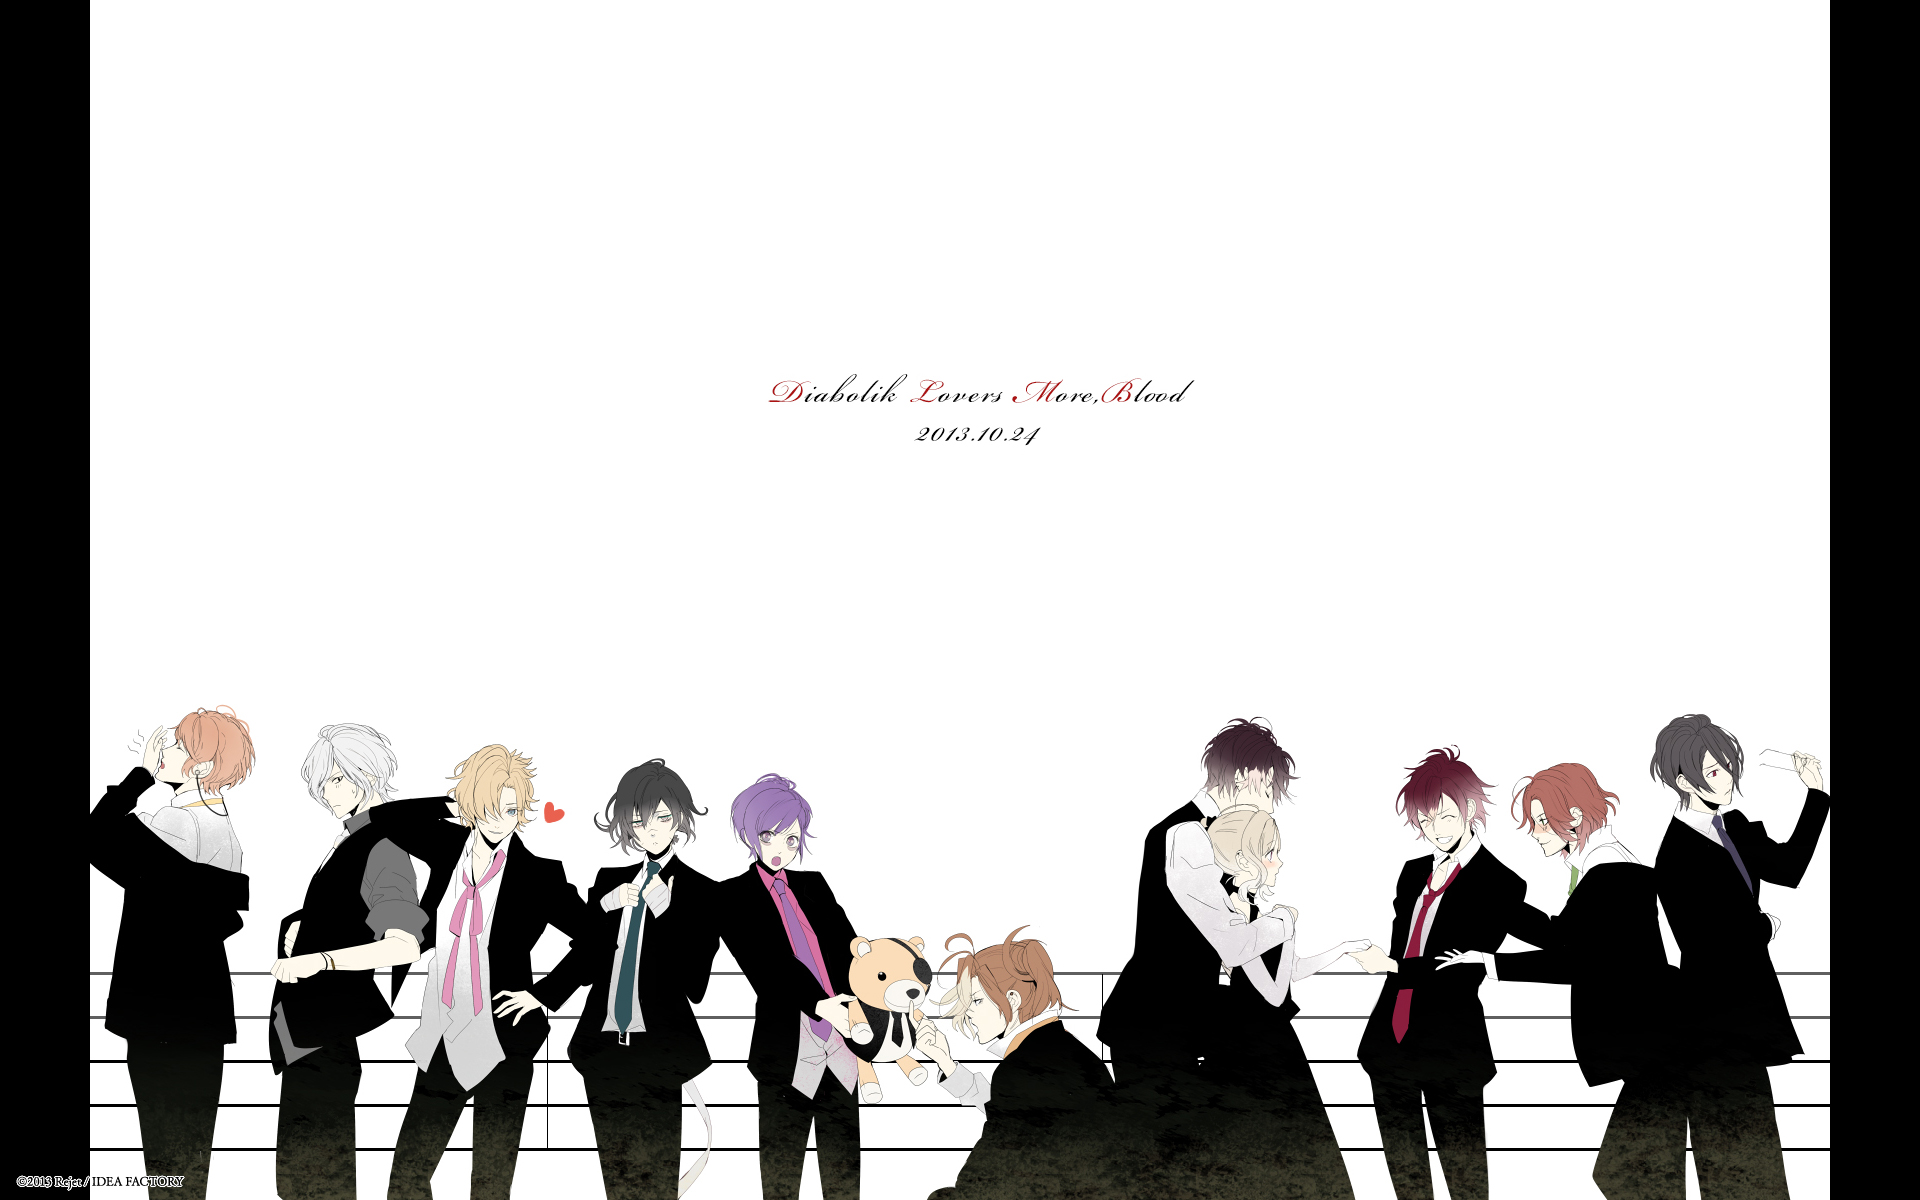 Diabolik Lovers ~Haunted dark bridal~, Wallpaper - Zerochan